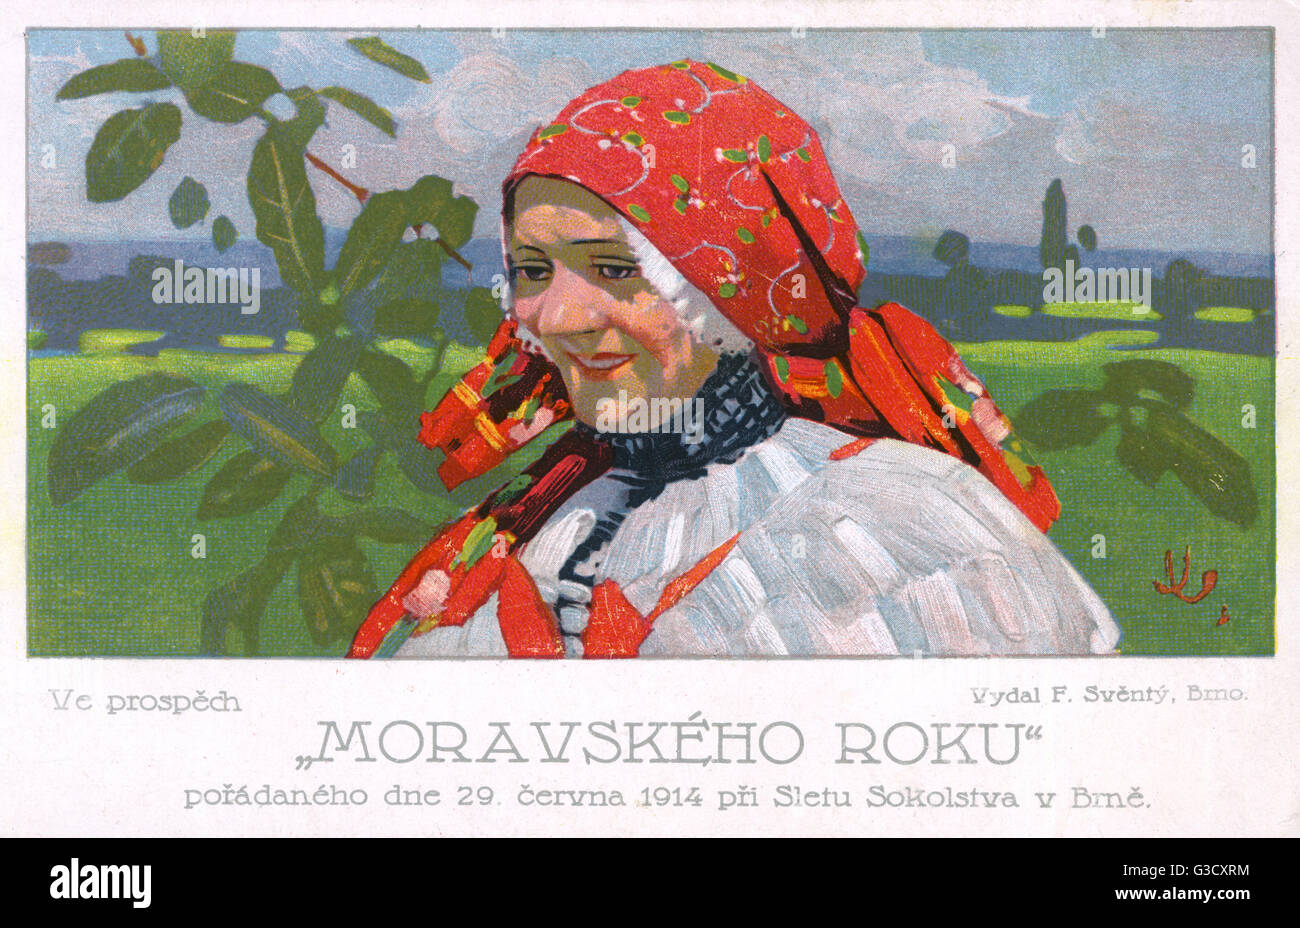 Sokol Rally, Brno, Czech Republic - Moravian Year Festival - held on 29th June 1914     Date: 1914 - Stock Image